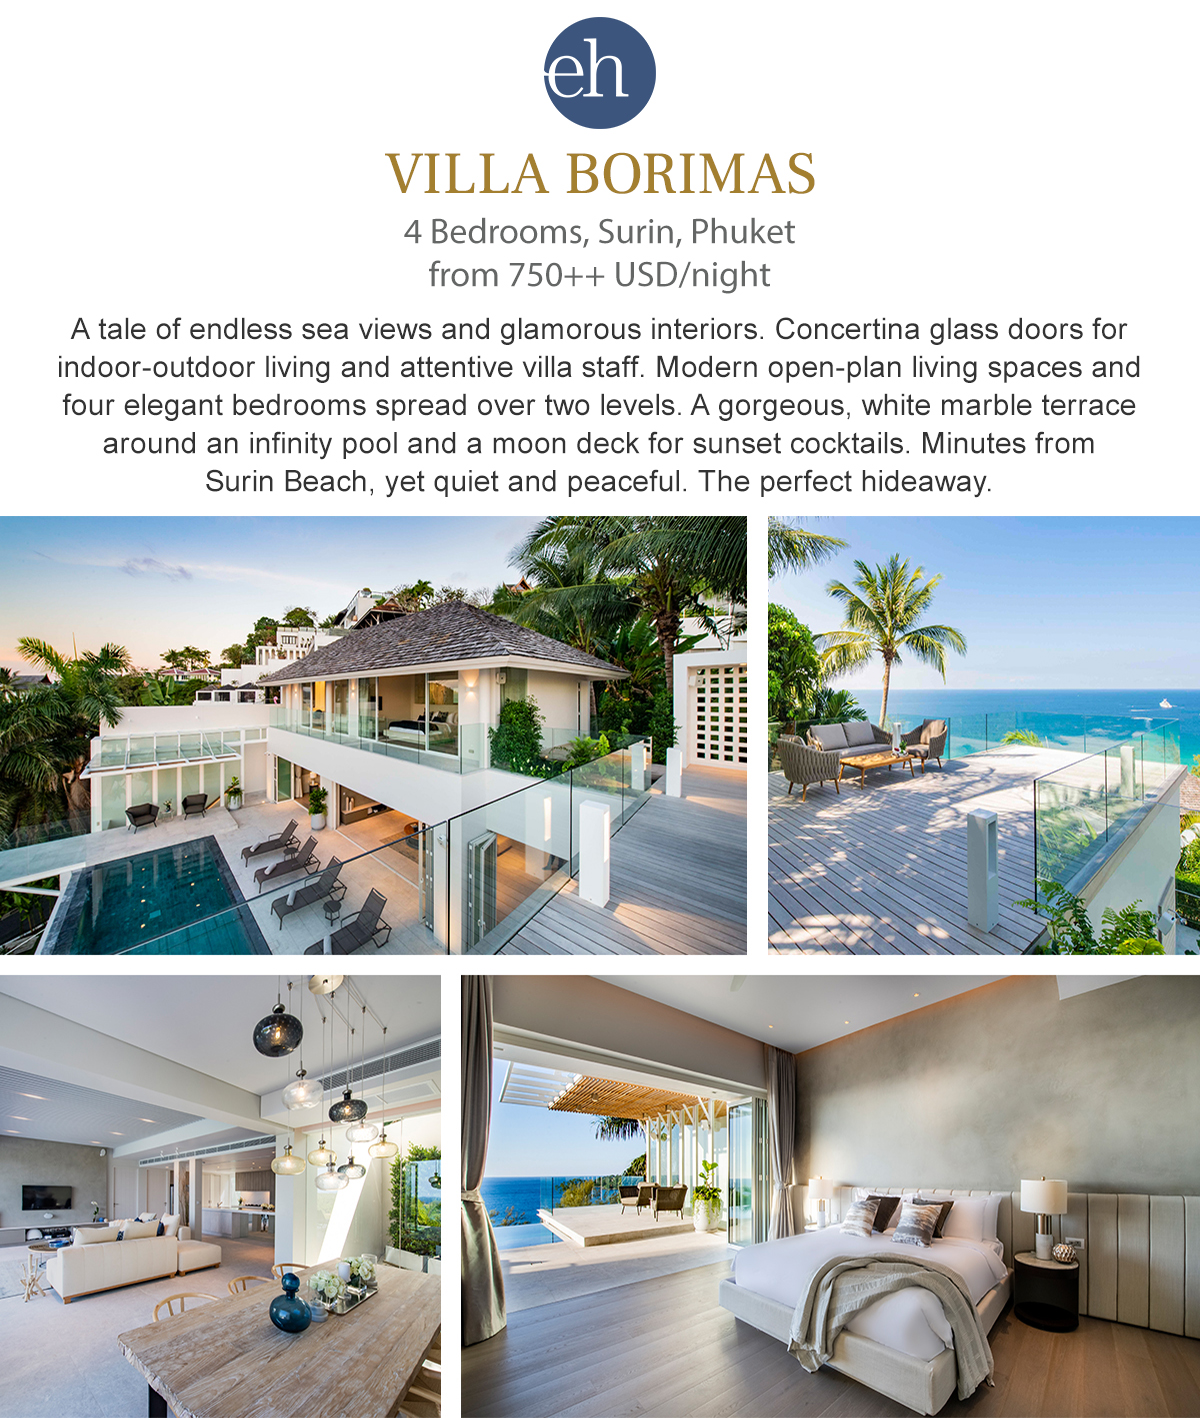 Villa Borimas - Surin, Phuket